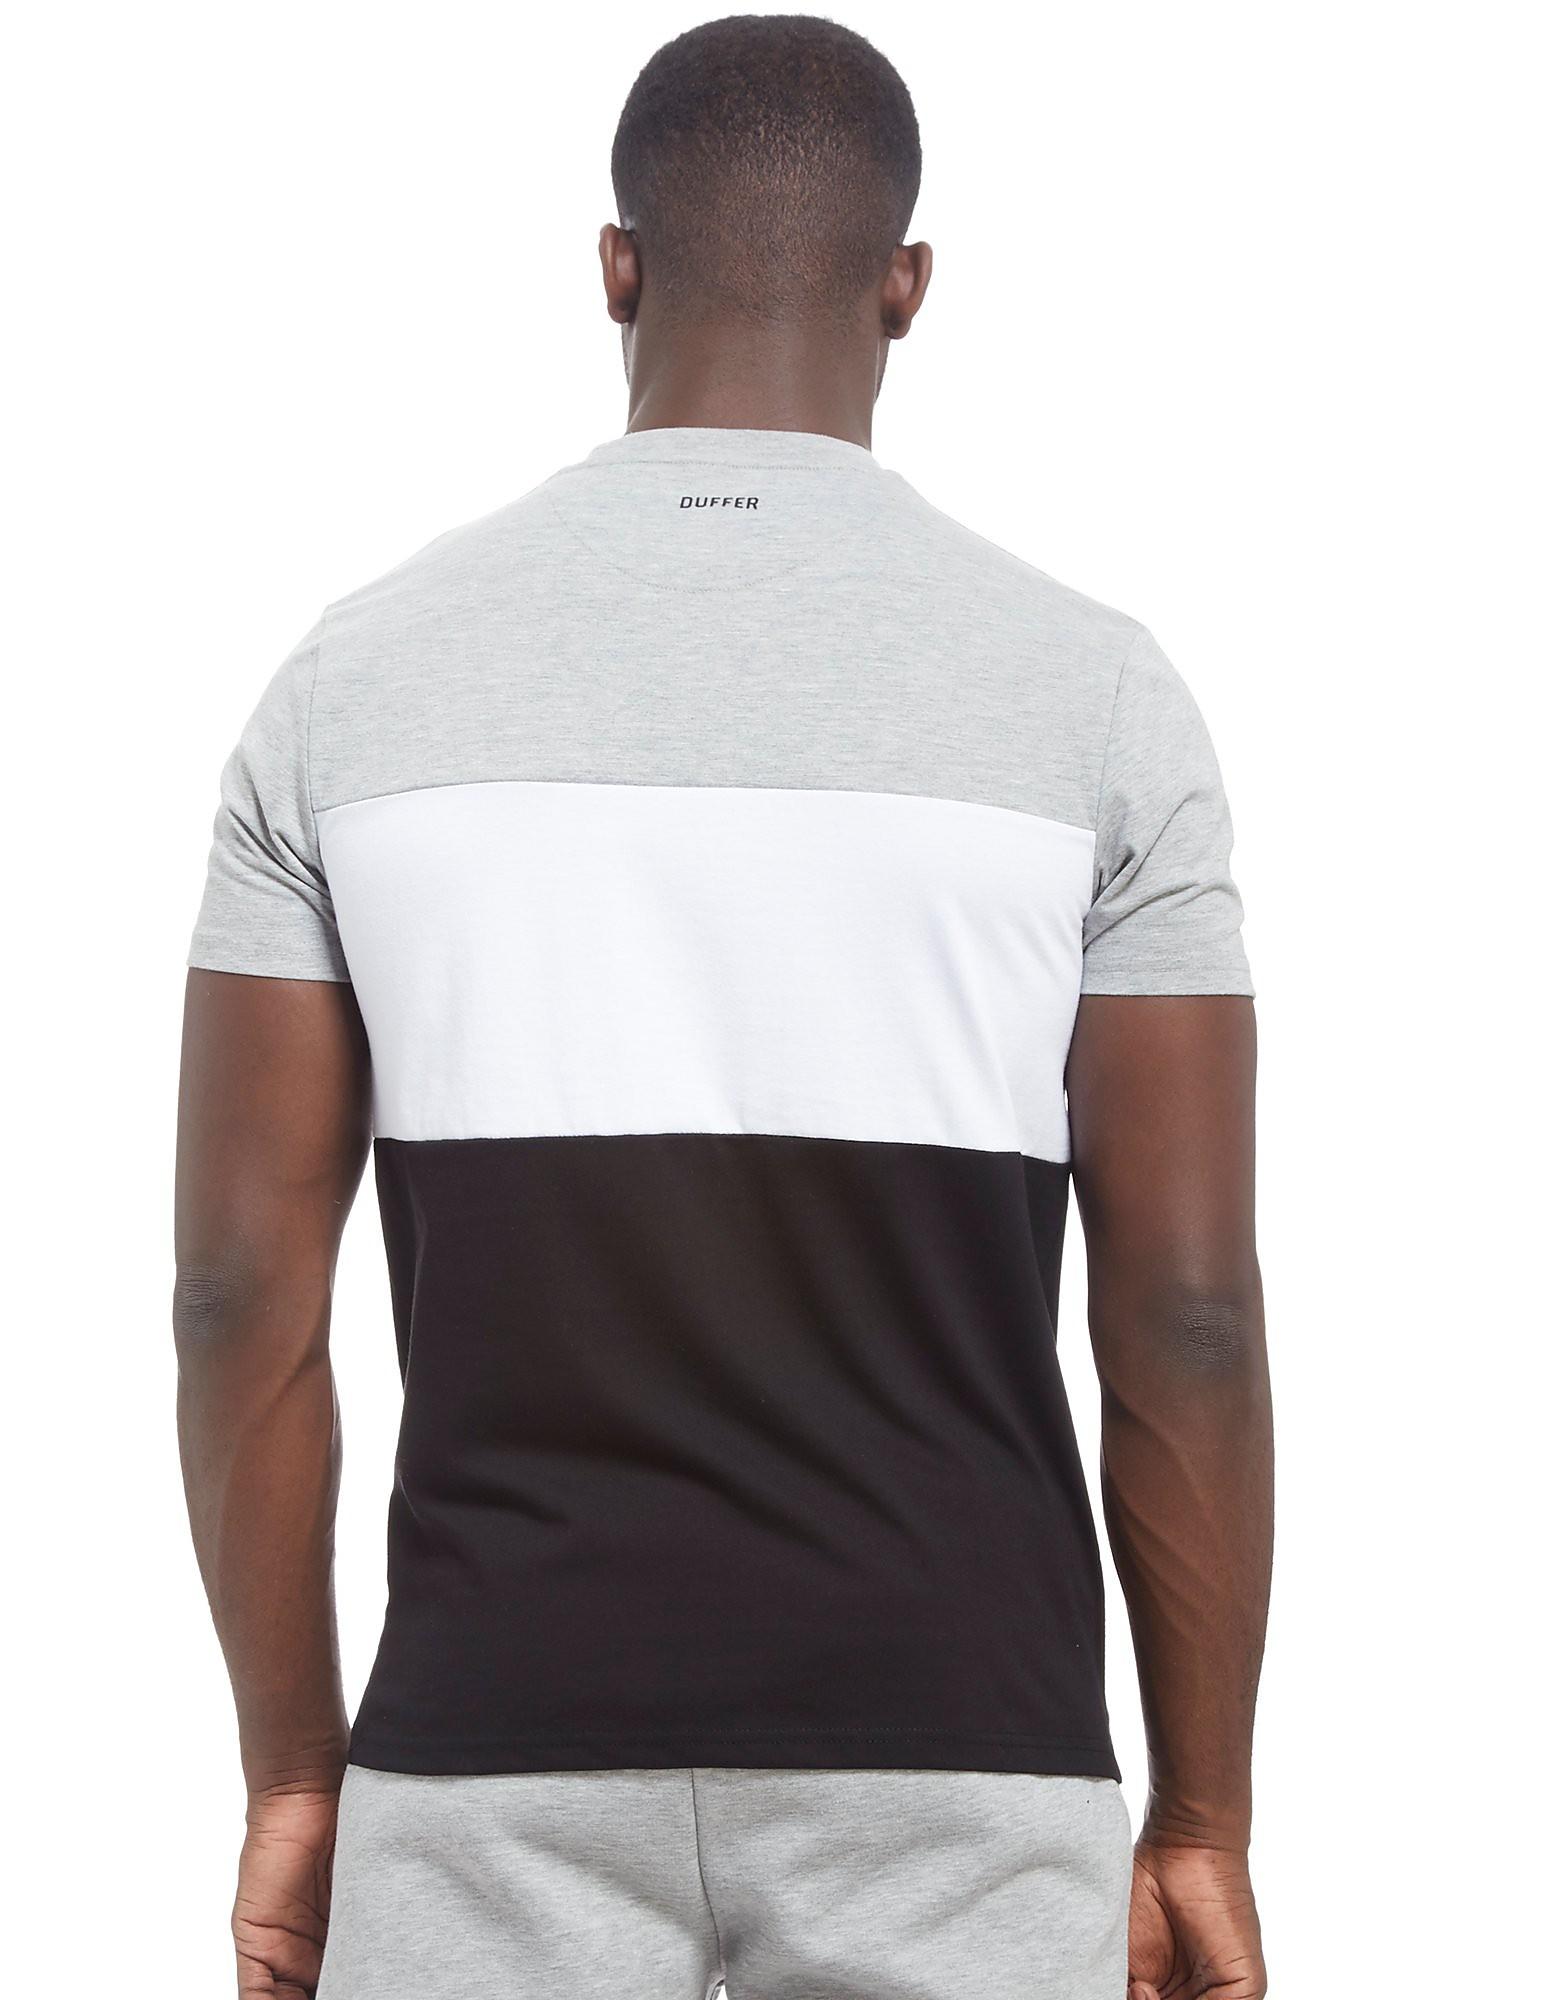 Duffer of St George Eckford T-Shirt